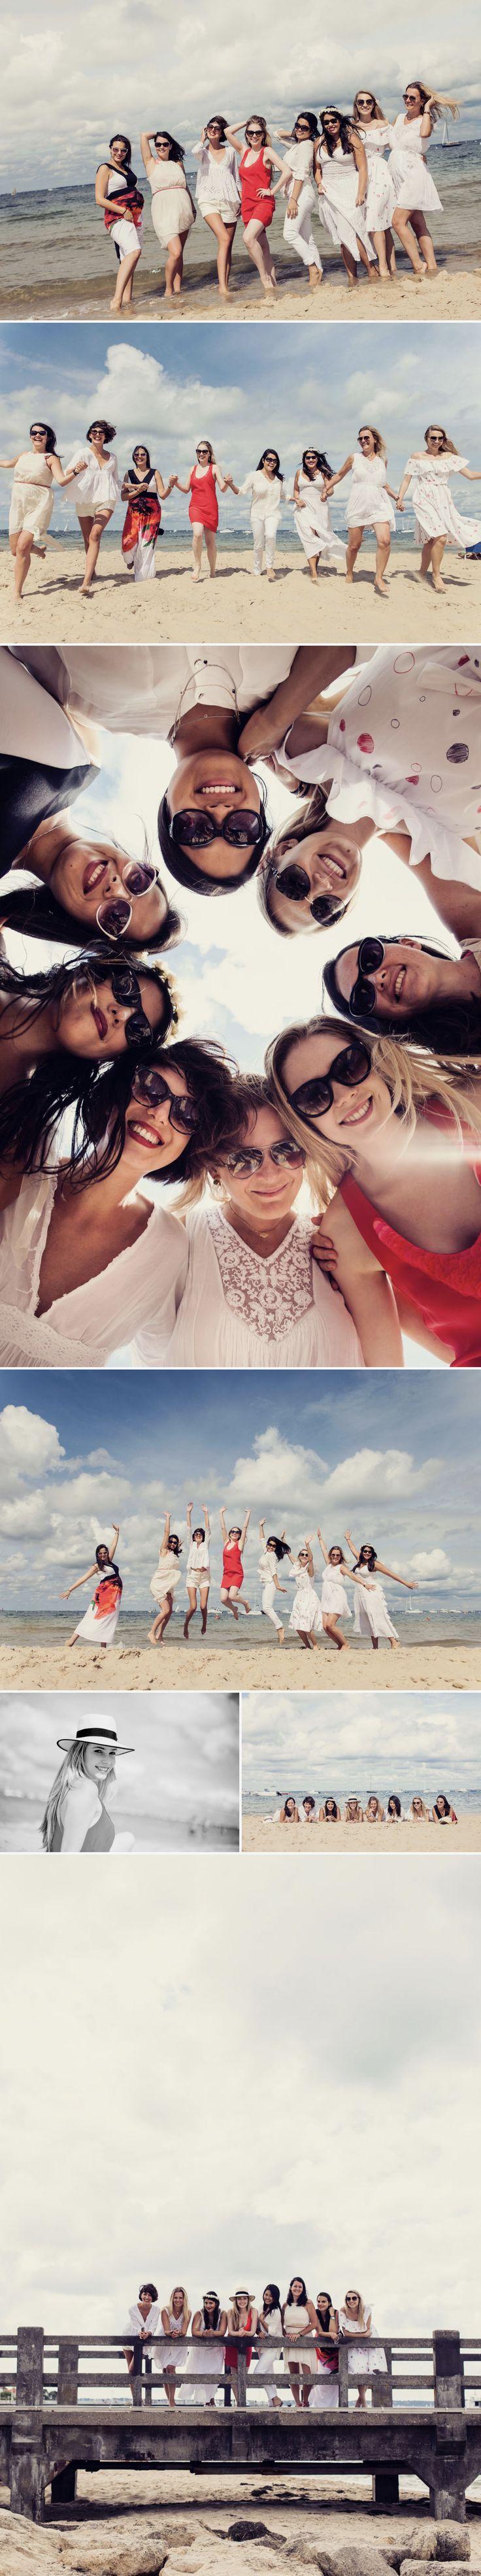 EVJF Kristina // Séance photo EVJF // Sarah Miramon Photographe #evjf #filles #plage #lifesyle #photo #photographe #arcachon